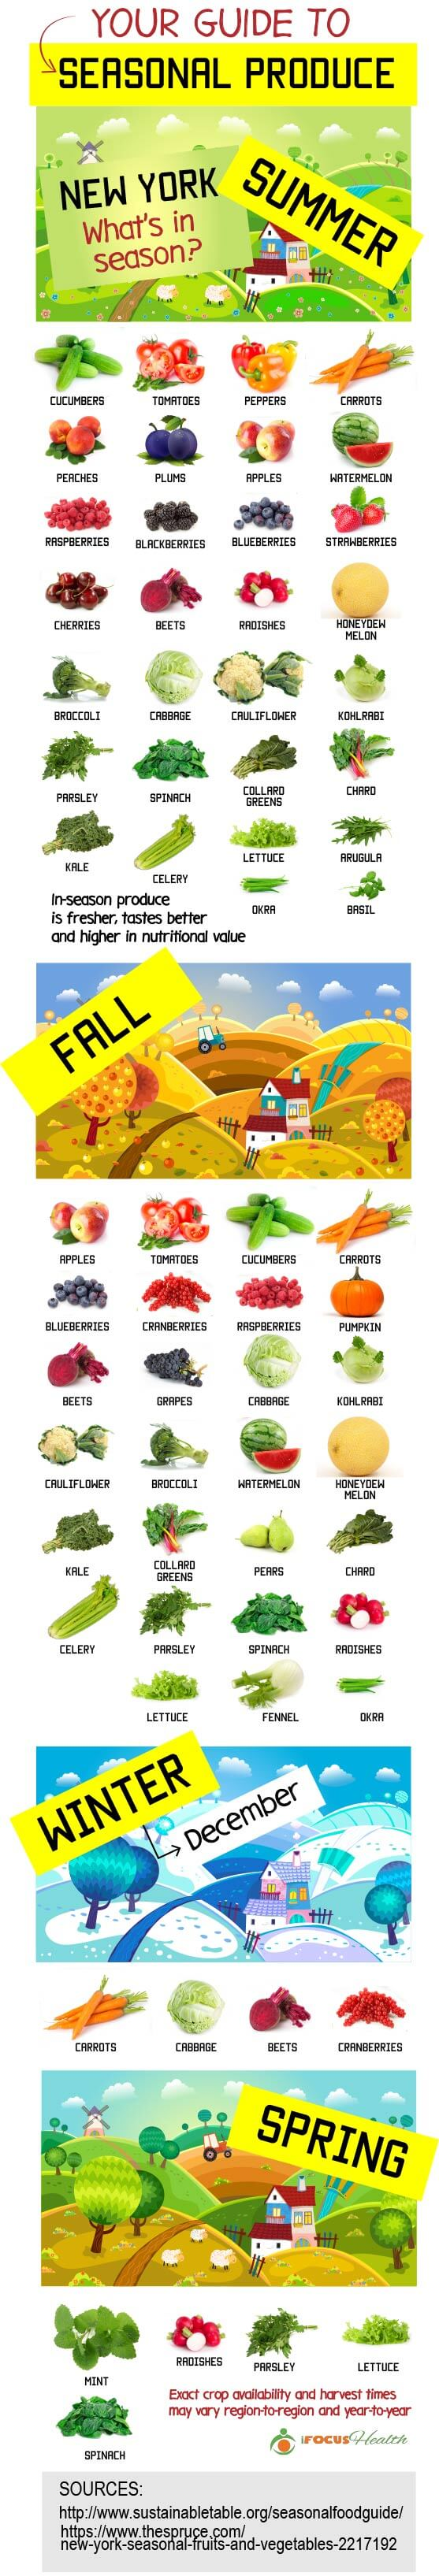 Your Guide to Seasonal Produce #infographic #Health #Seasonal Fruits #Seasonal Vegetables